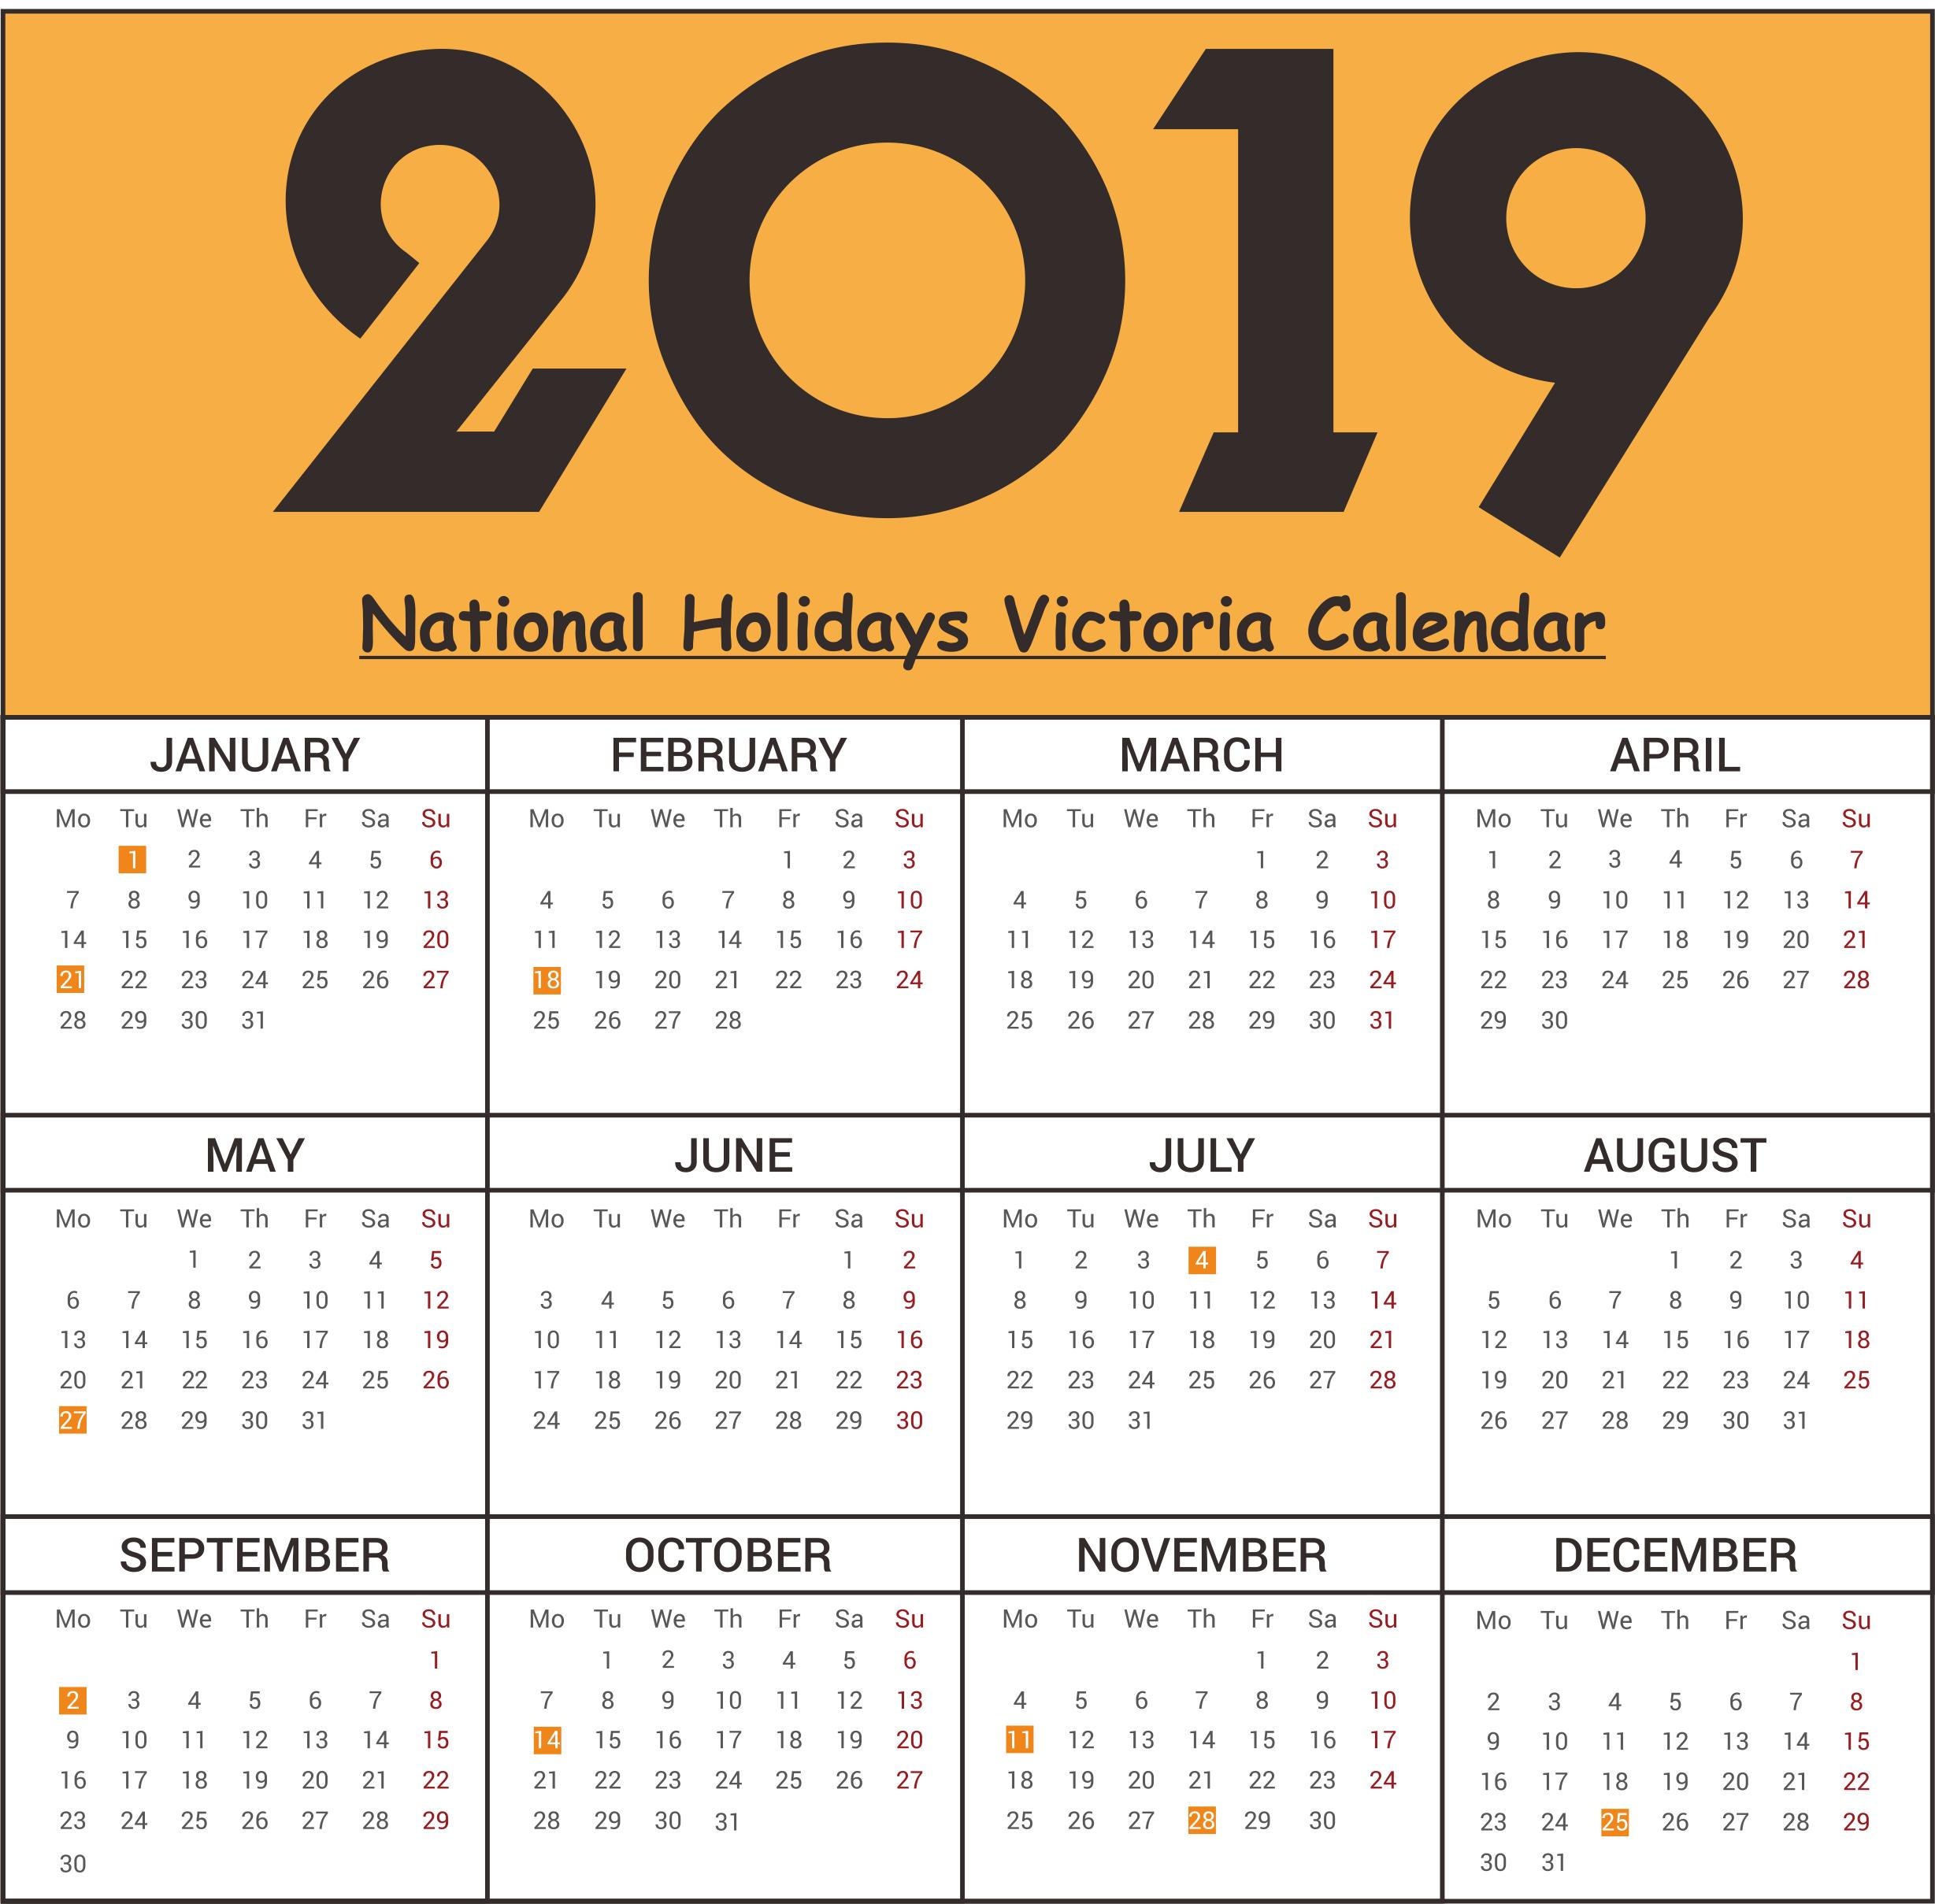 Free Victoria National Holidays 2019 Calendar Templates | Free Calendar 2019 Victoria School Holidays